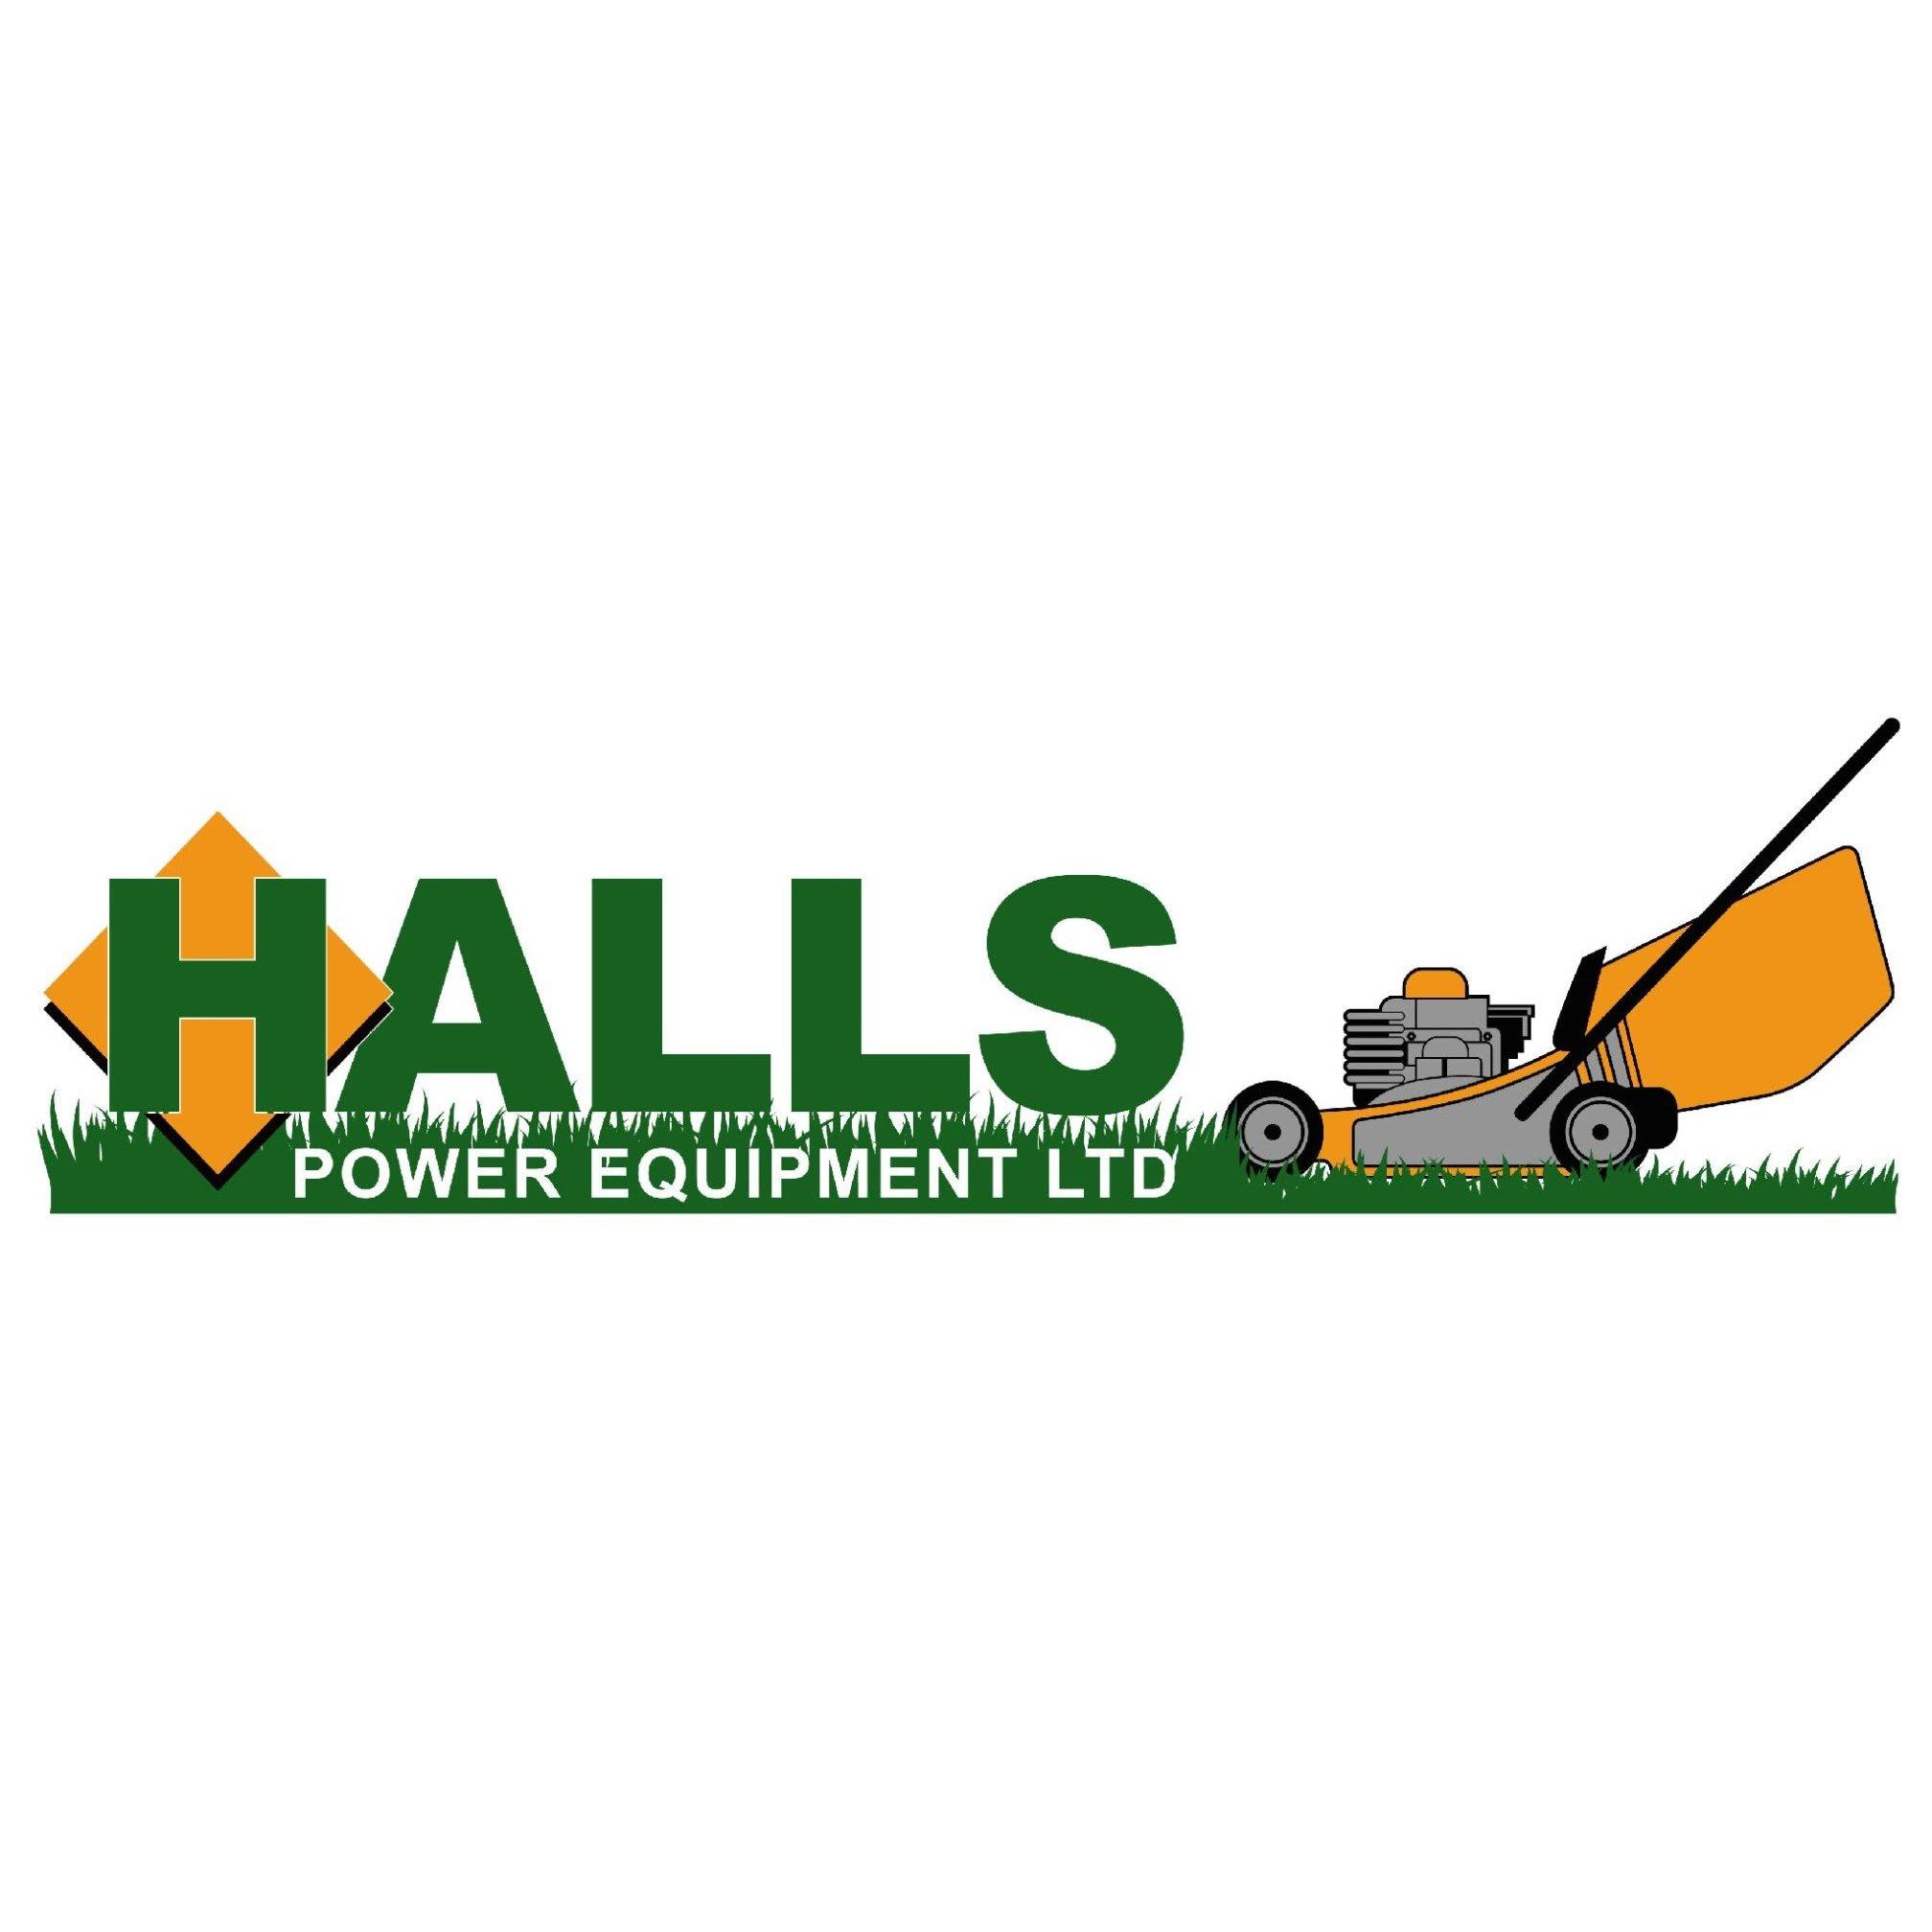 Halls Power Equipment Ltd - Norwich, Norfolk NR11 7HN - 01263 768689 | ShowMeLocal.com